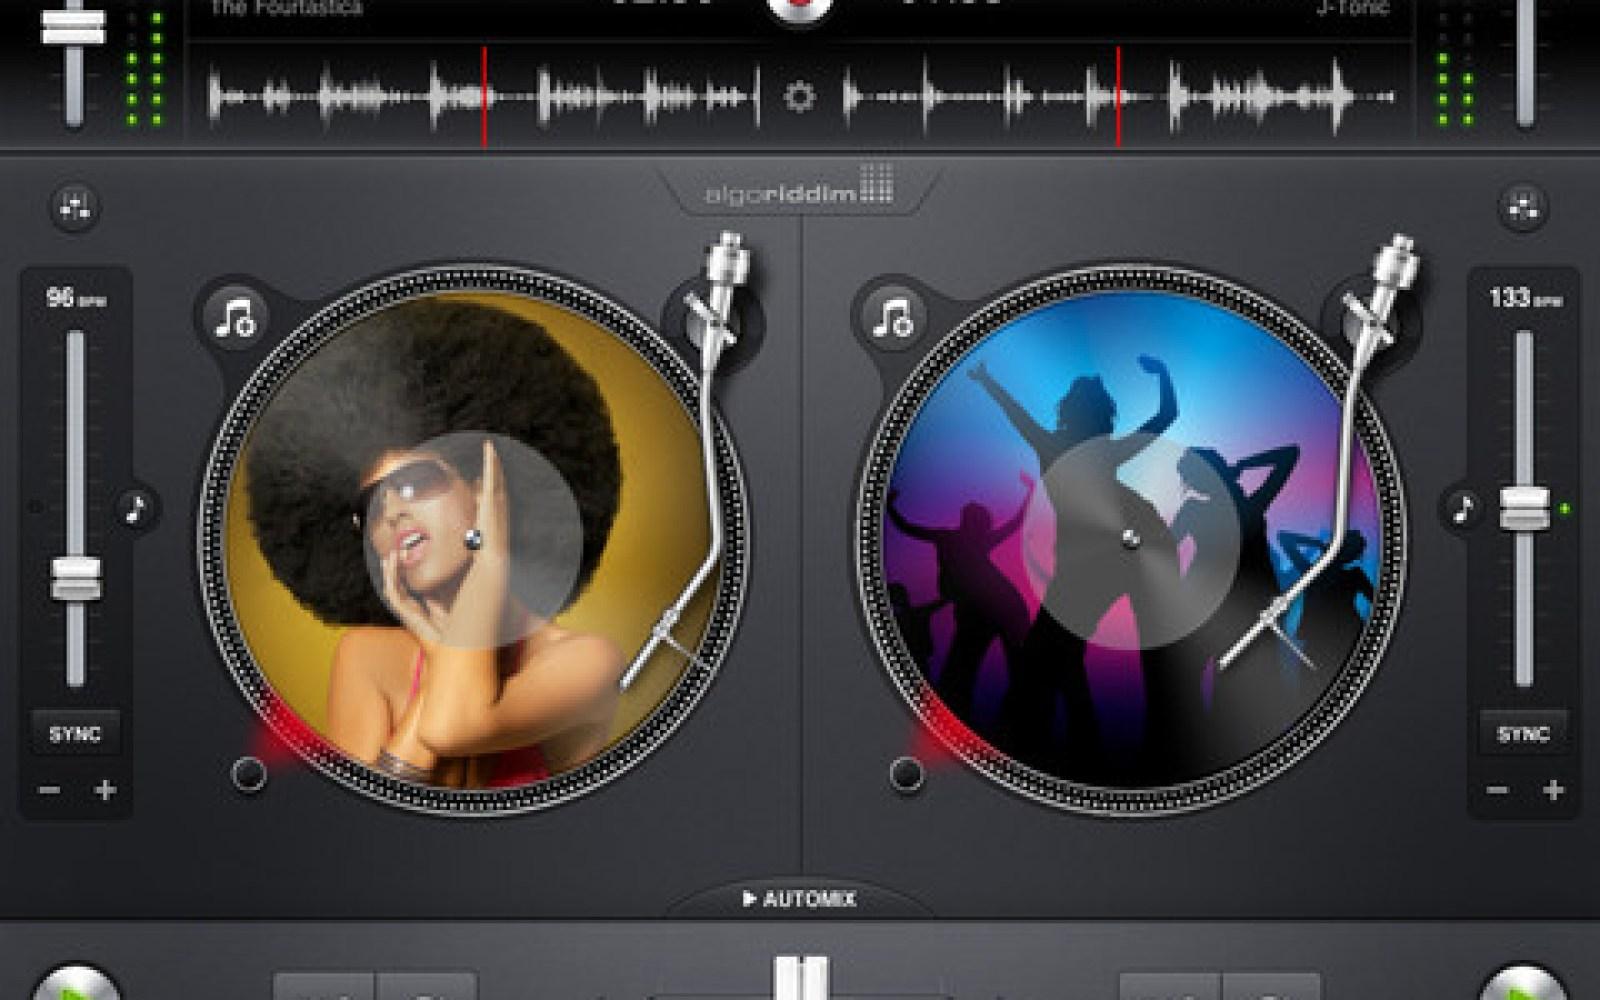 Algoriddim's 'djay' apps get Audiobus support alongside new features & enhancements